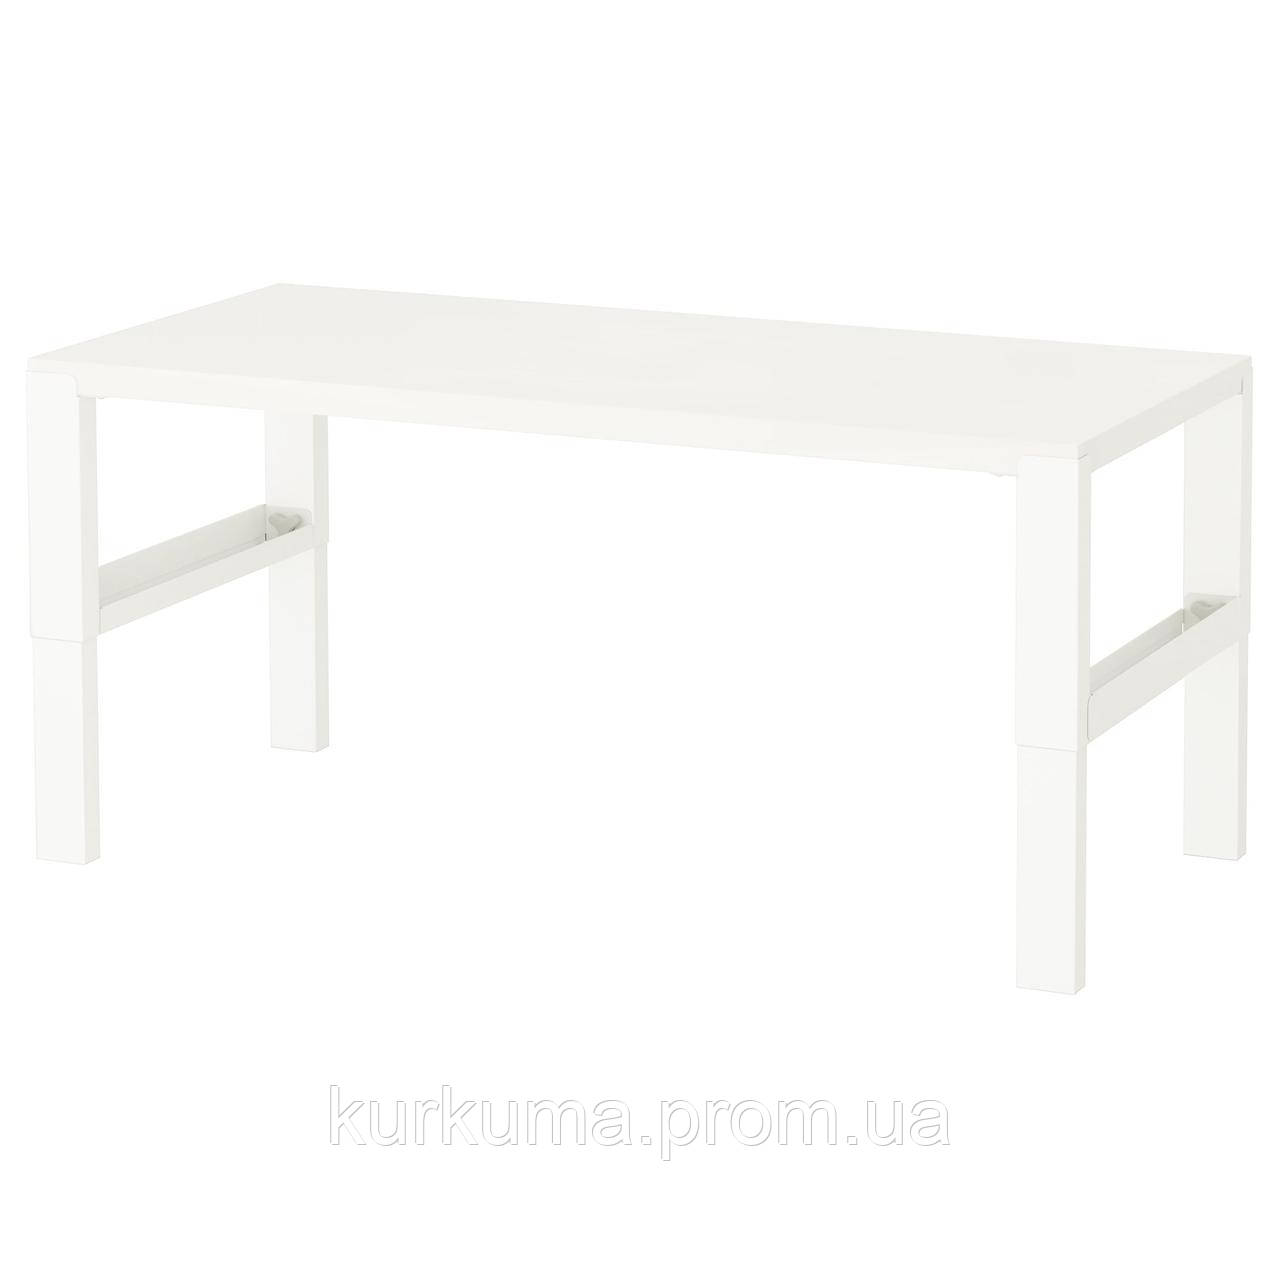 IKEA PAHL Стол, белый  (891.289.53)